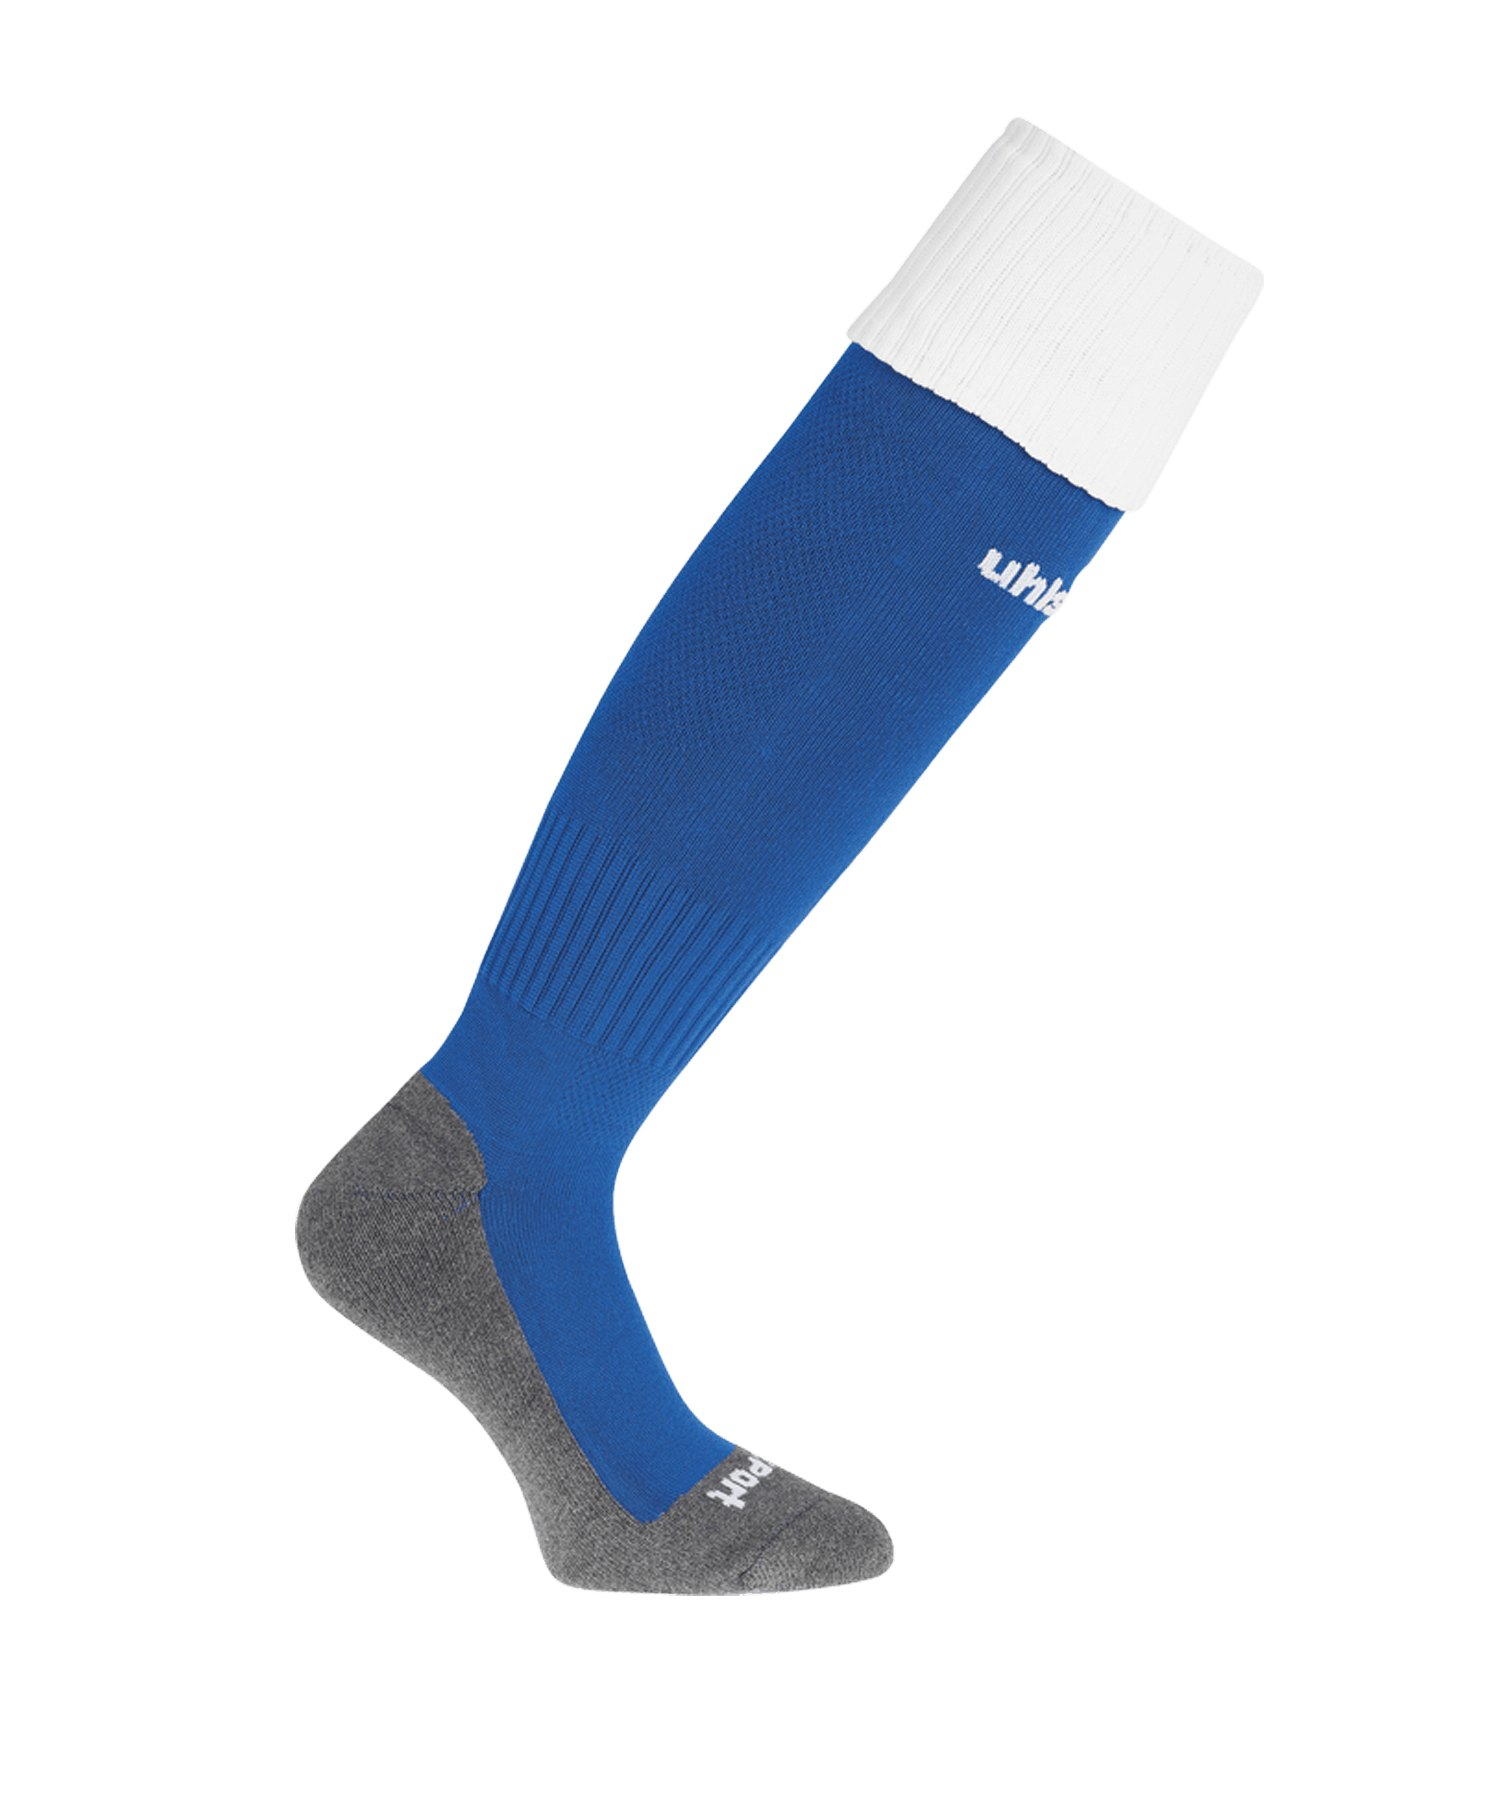 Uhlsport Club Stutzenstrumpf Blau Weiss F03 - blau